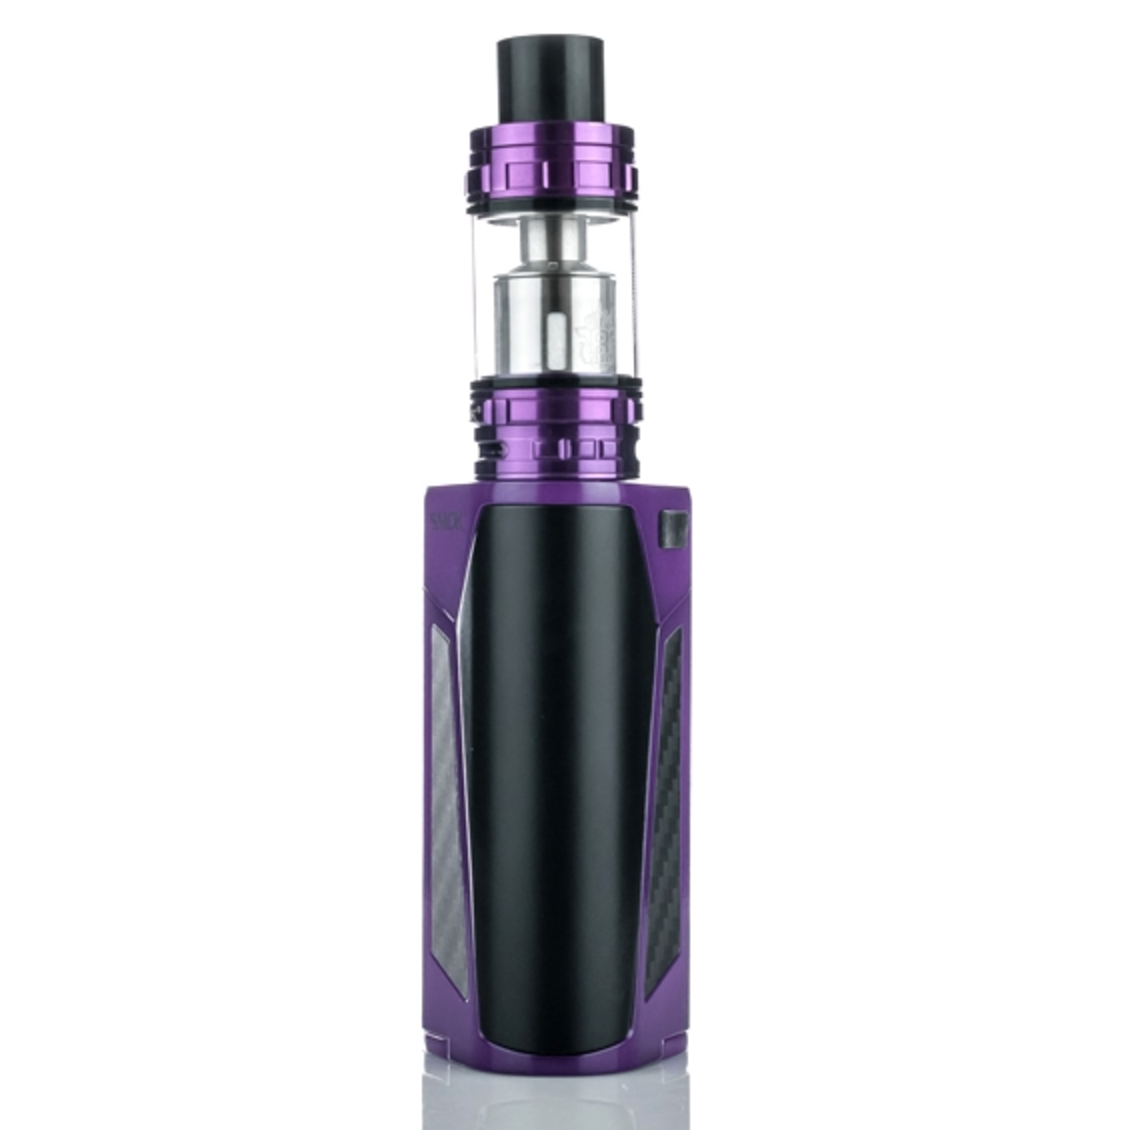 Smok Gx350 Review This Mod Runs Four 18650 Vape Batteries